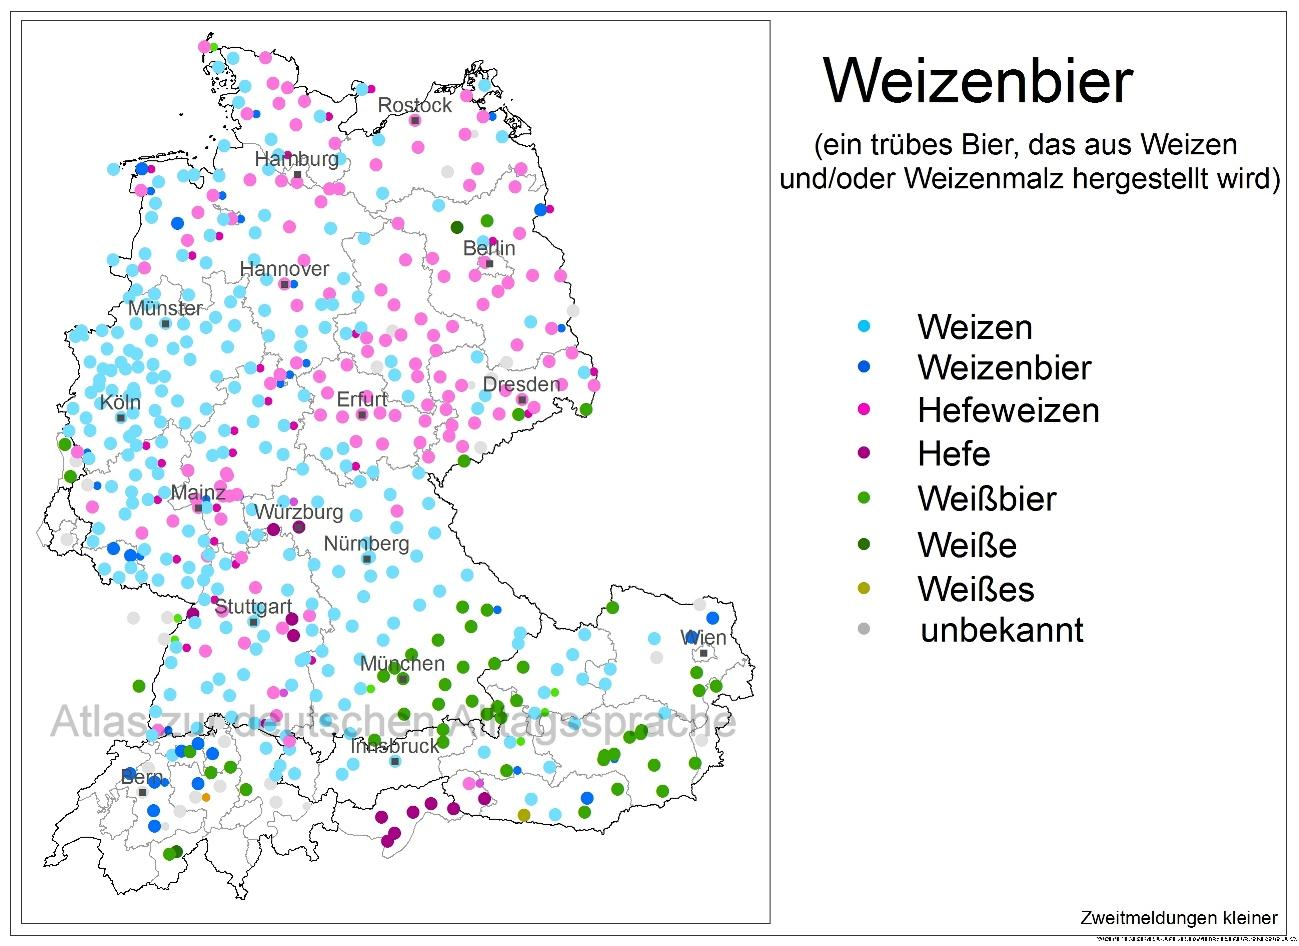 11_5h_Weissbier